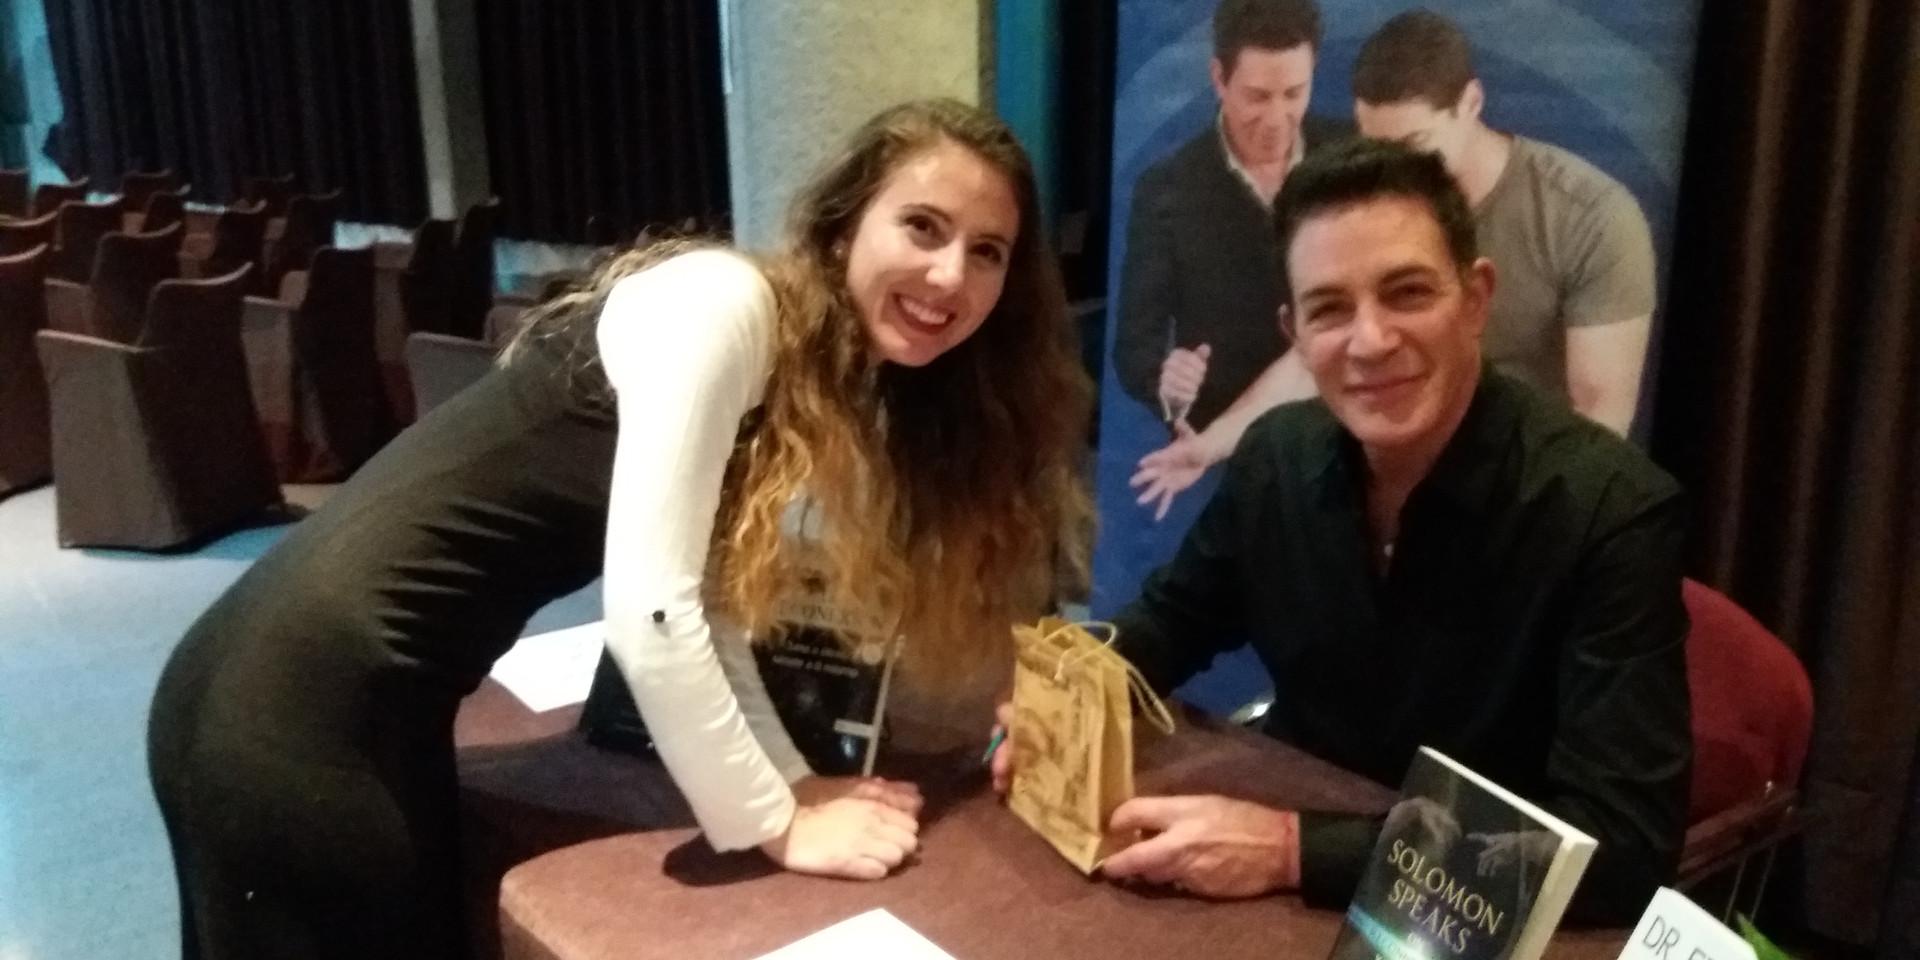 Tanya Hadzhieva and Eric Pearl